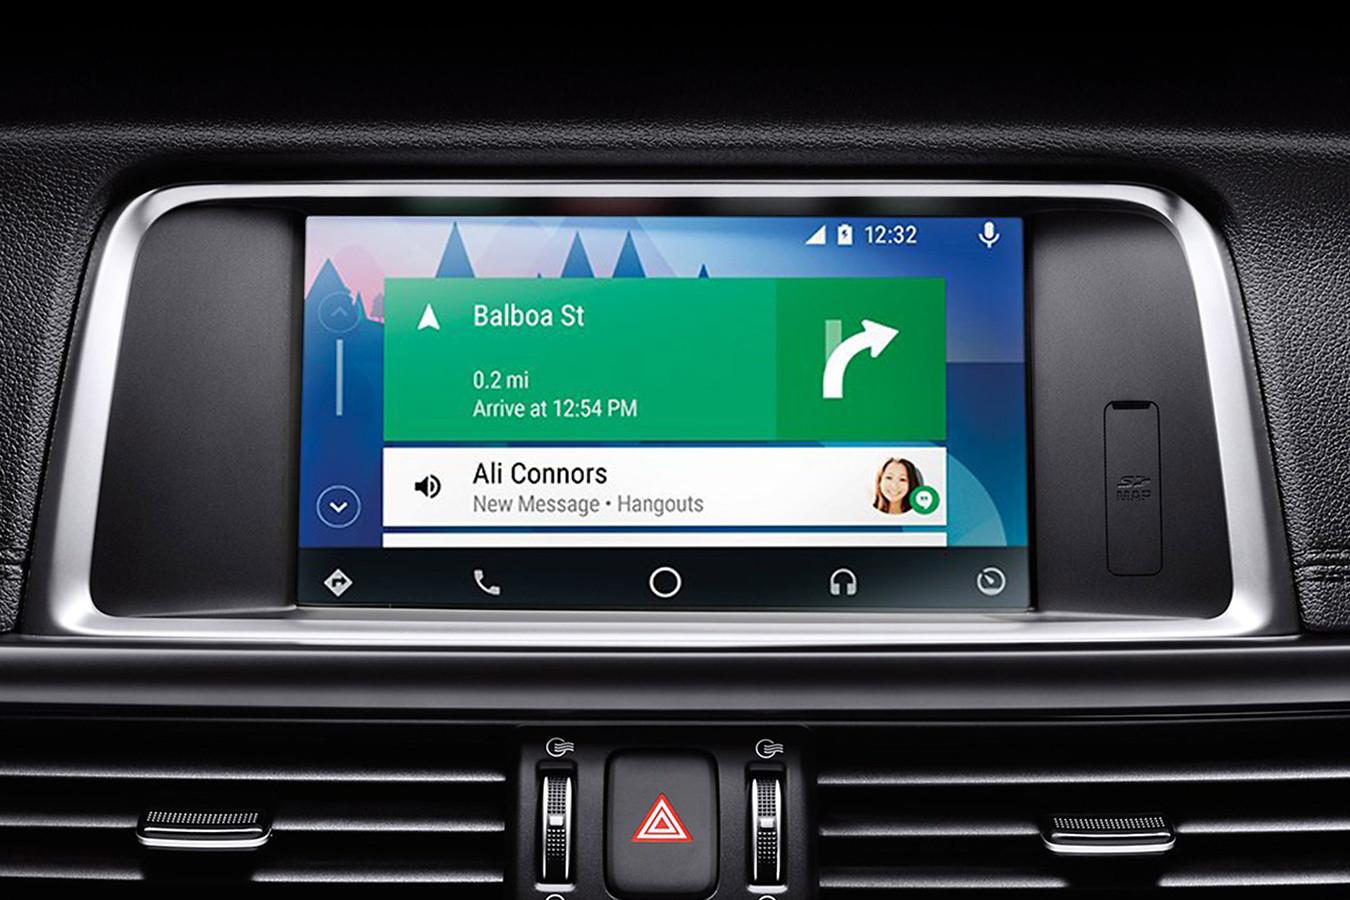 2020 Kia Optima Touchscreen Display